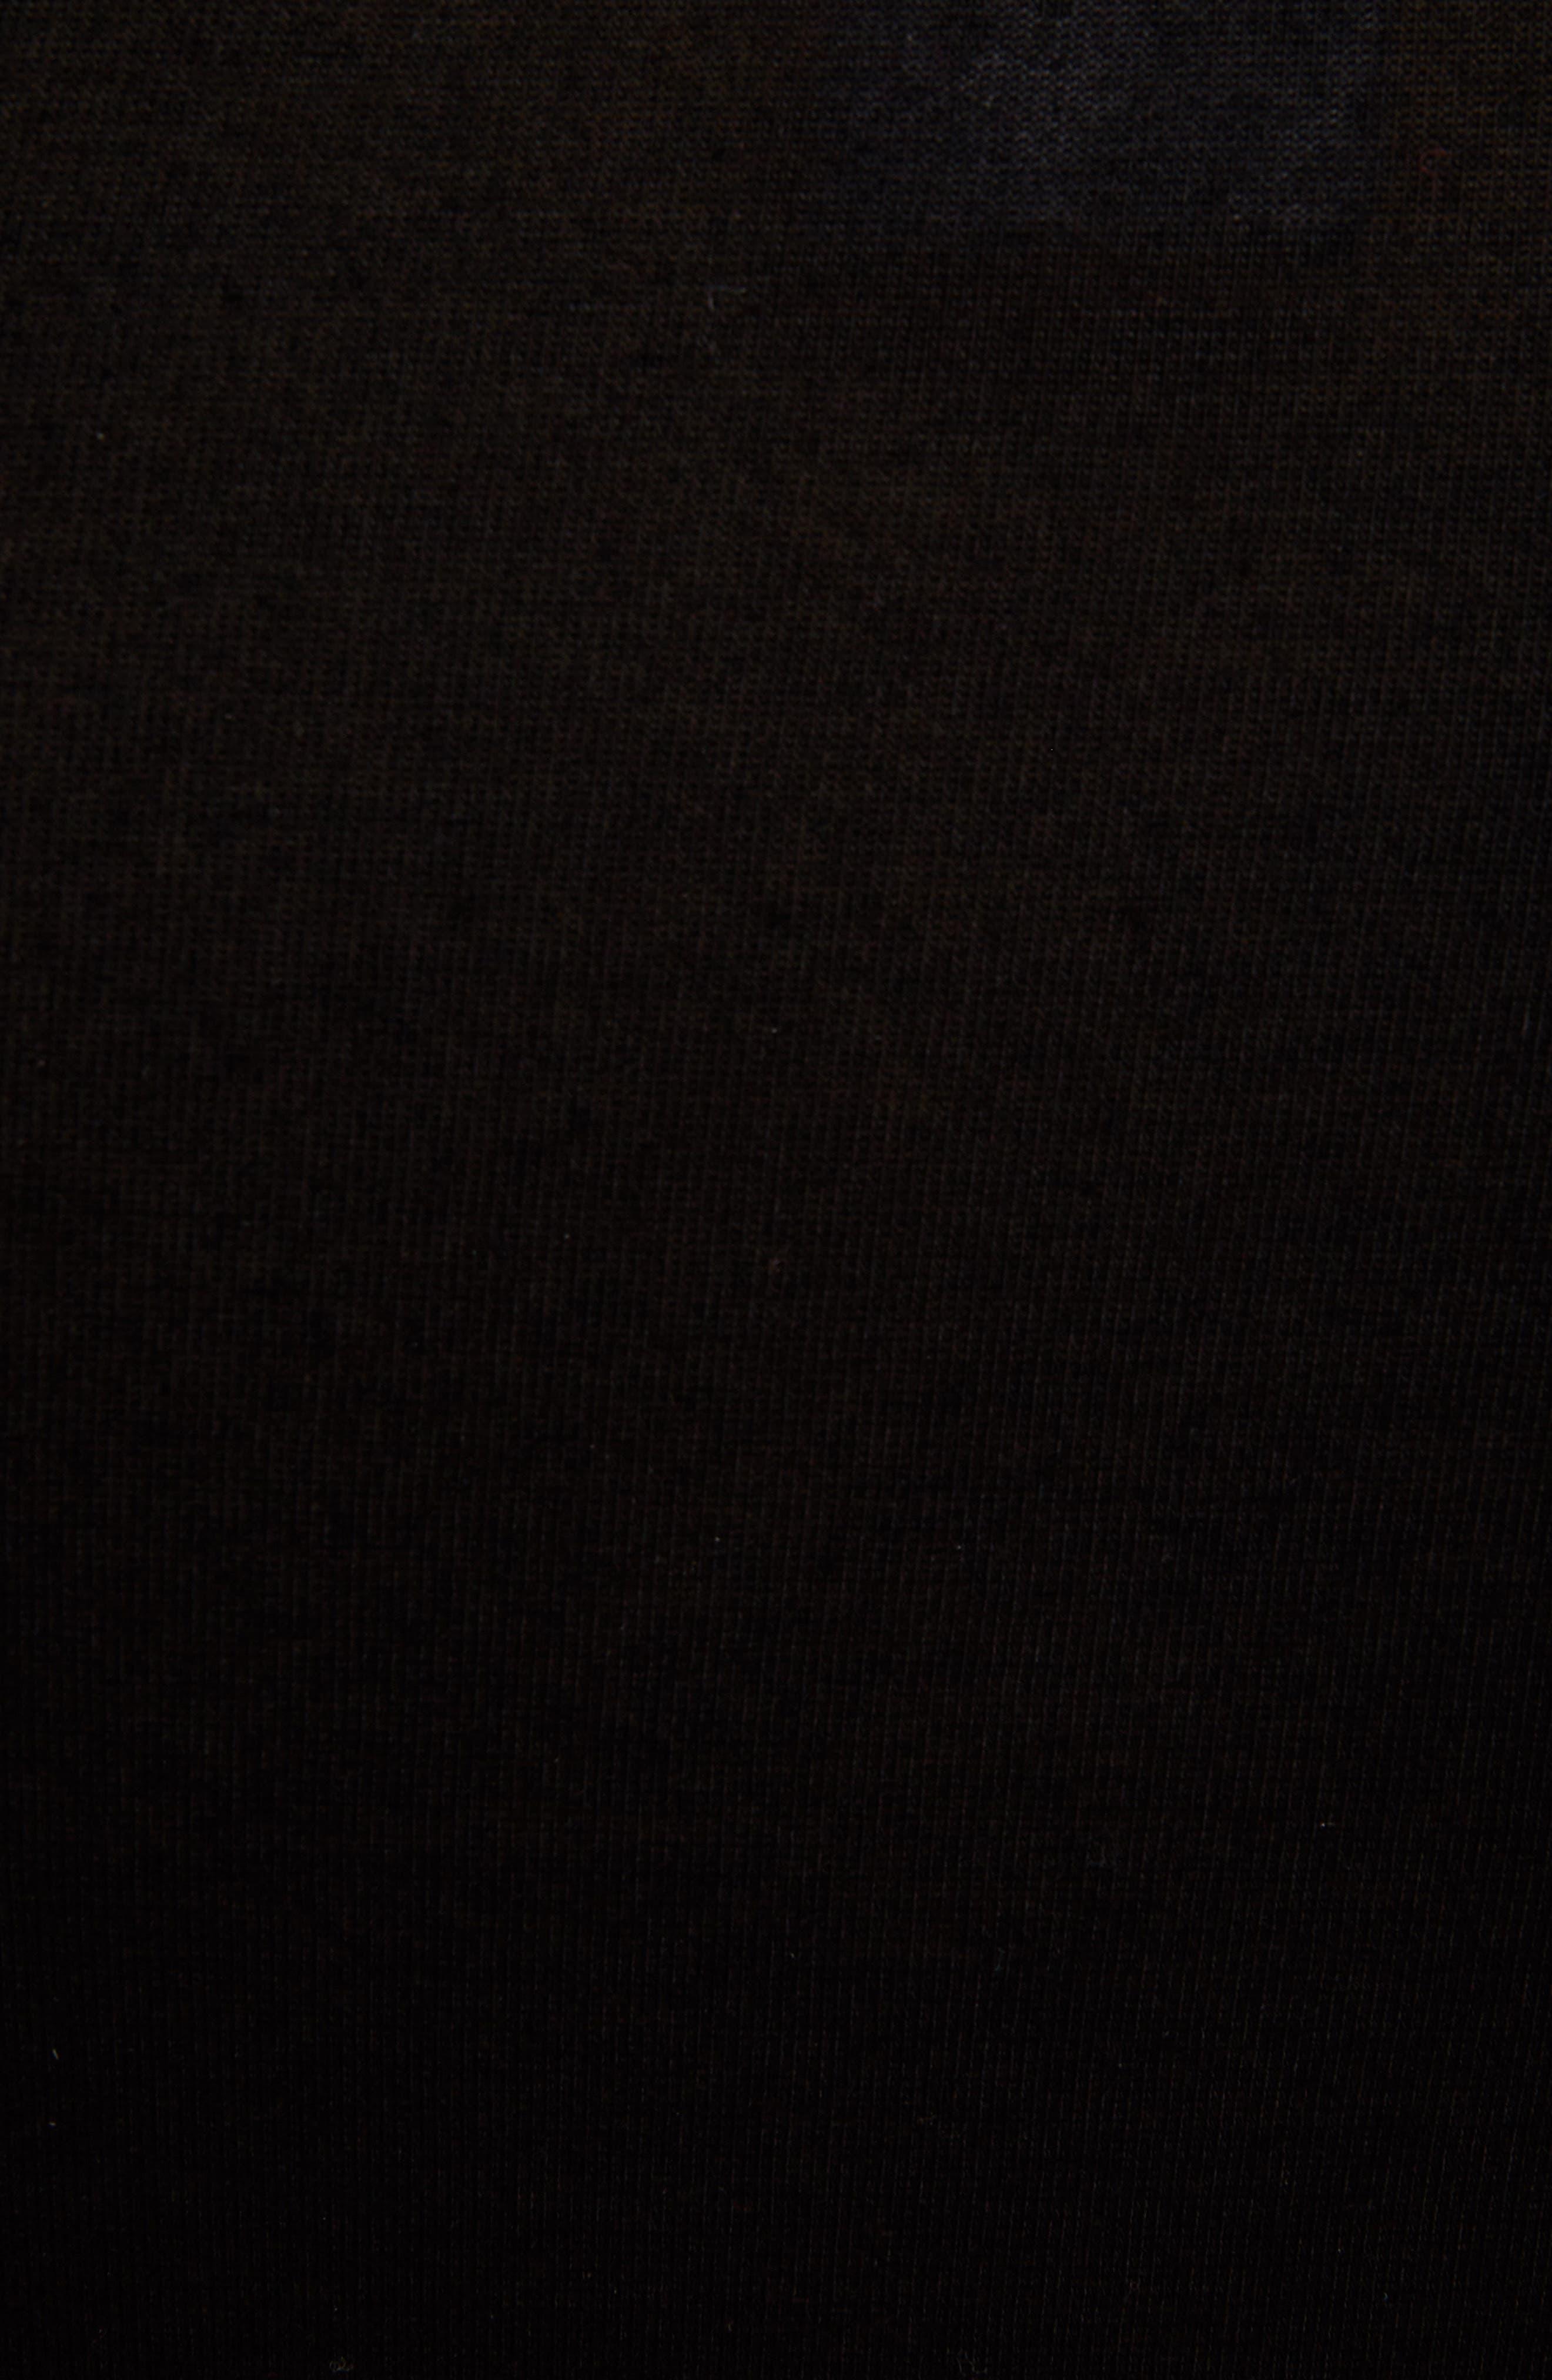 Ruffle Sleeve Jersey Top,                             Alternate thumbnail 5, color,                             Black